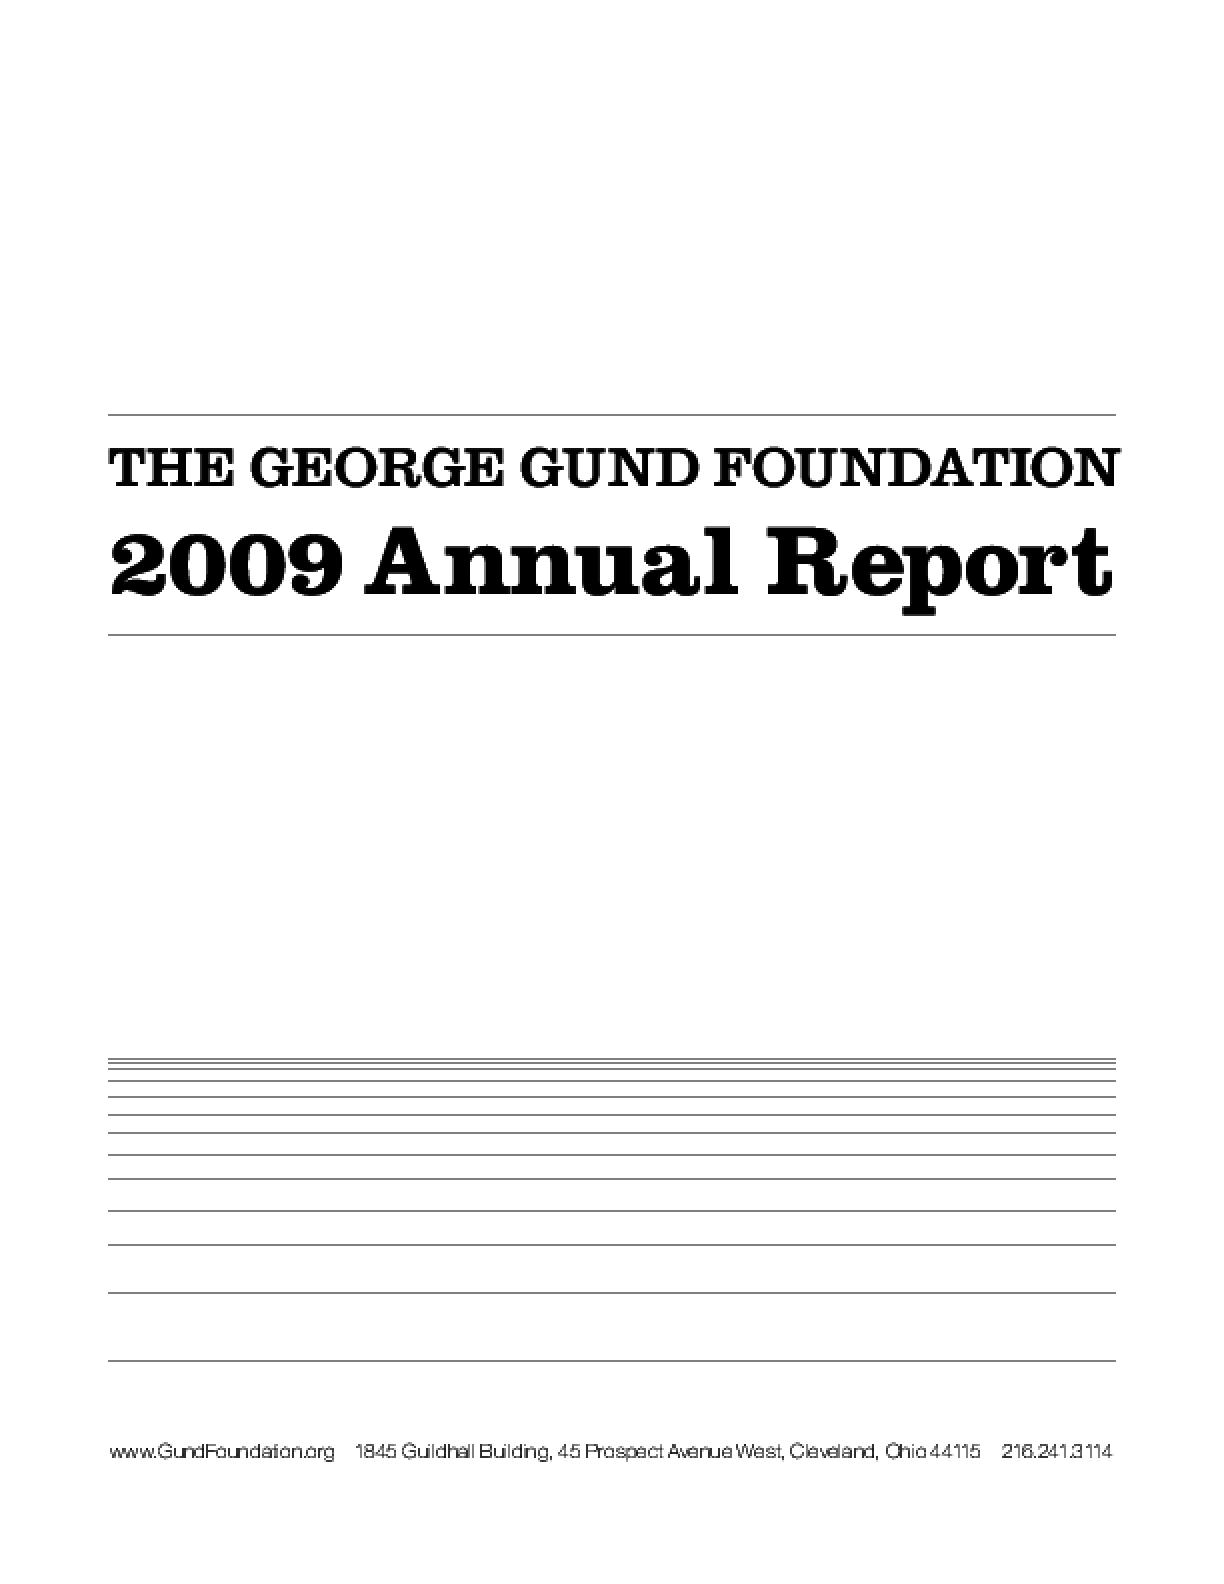 George Gund Foundation - 2009 Annual Report